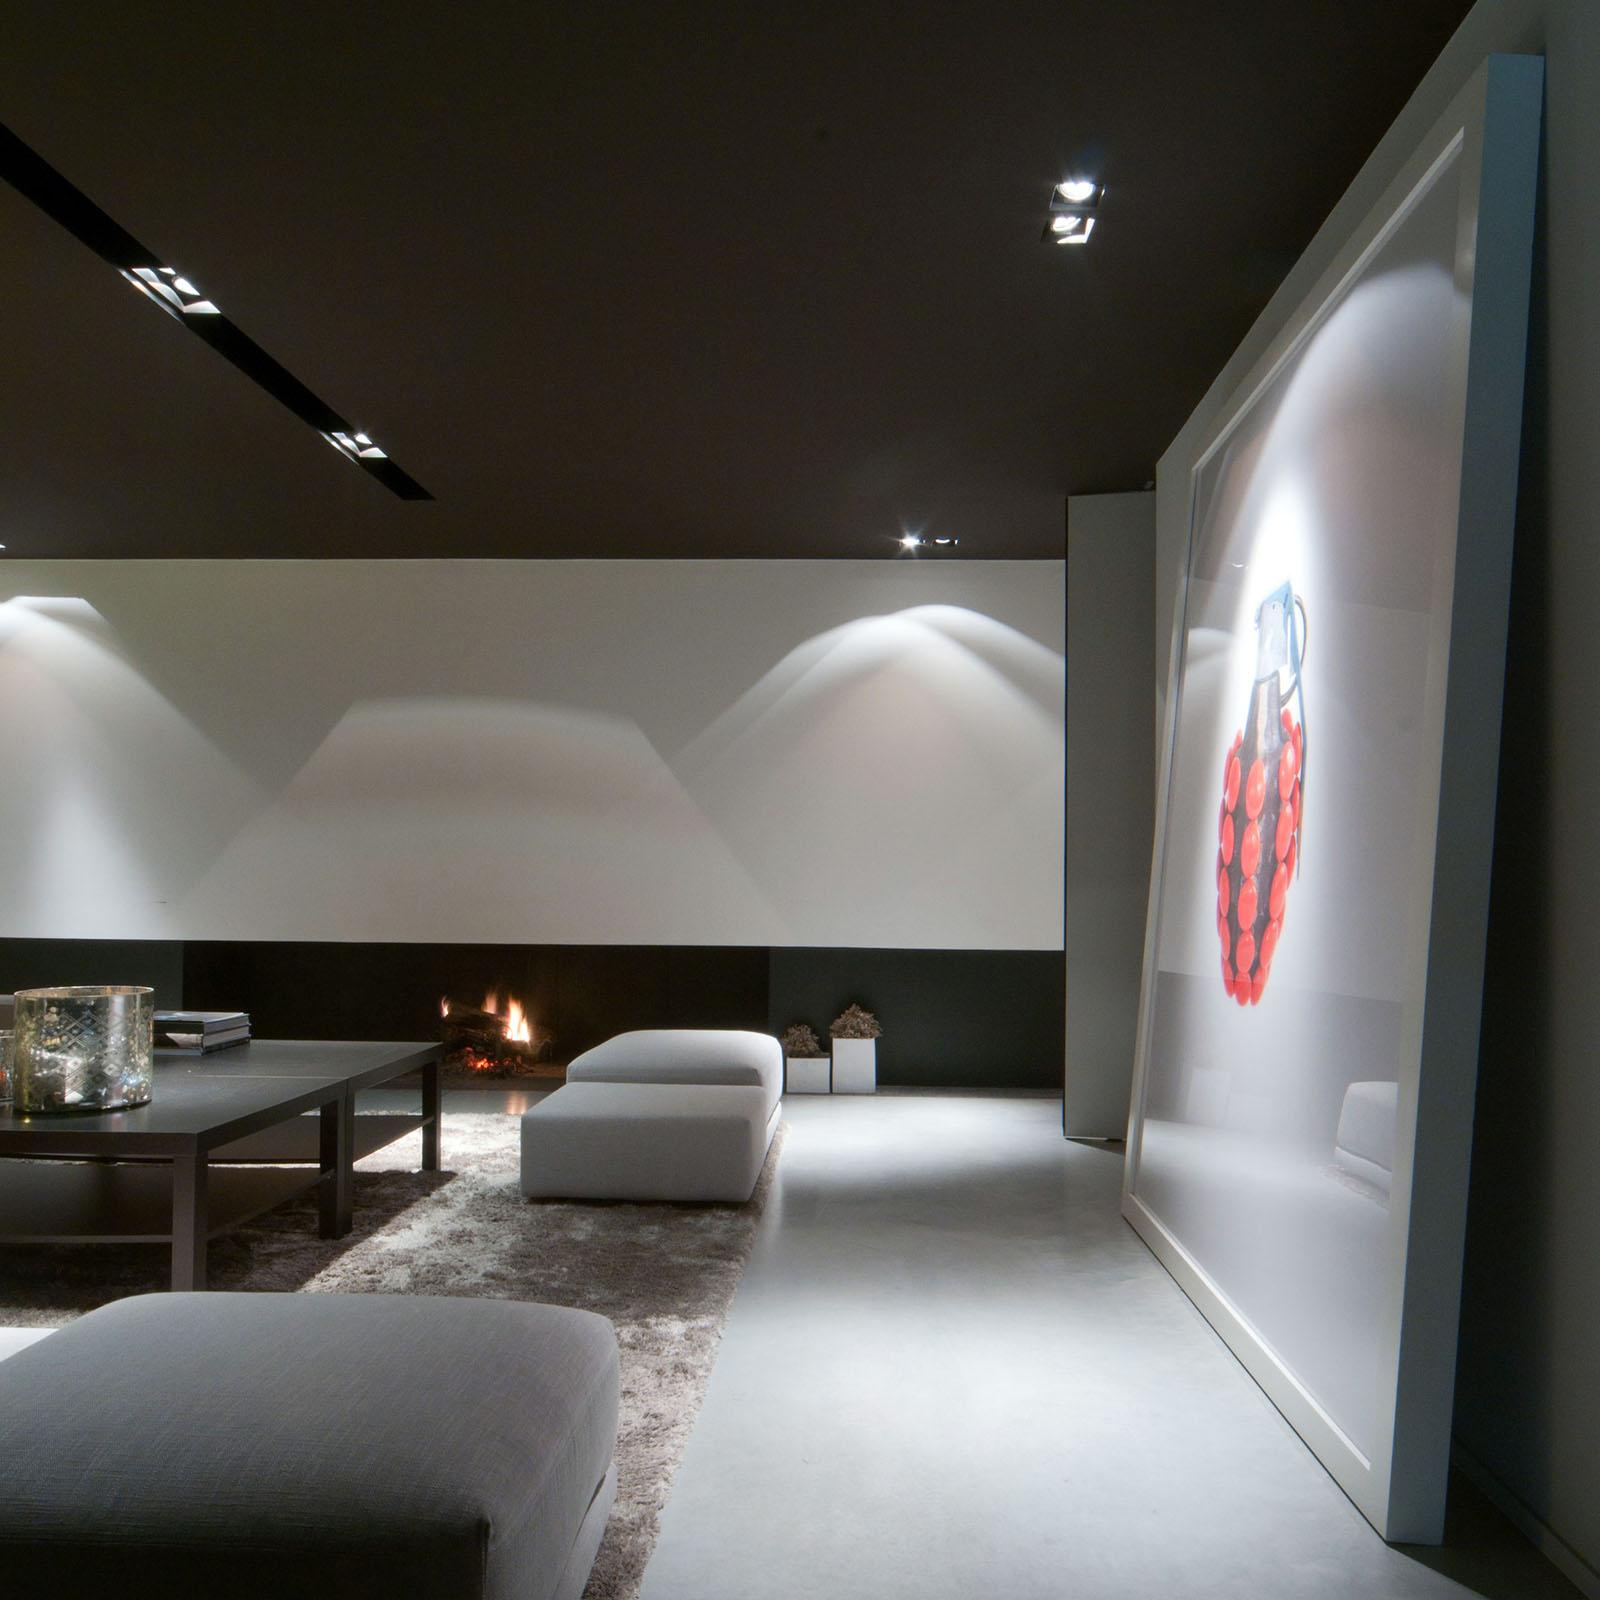 inspiration d co maison viving. Black Bedroom Furniture Sets. Home Design Ideas